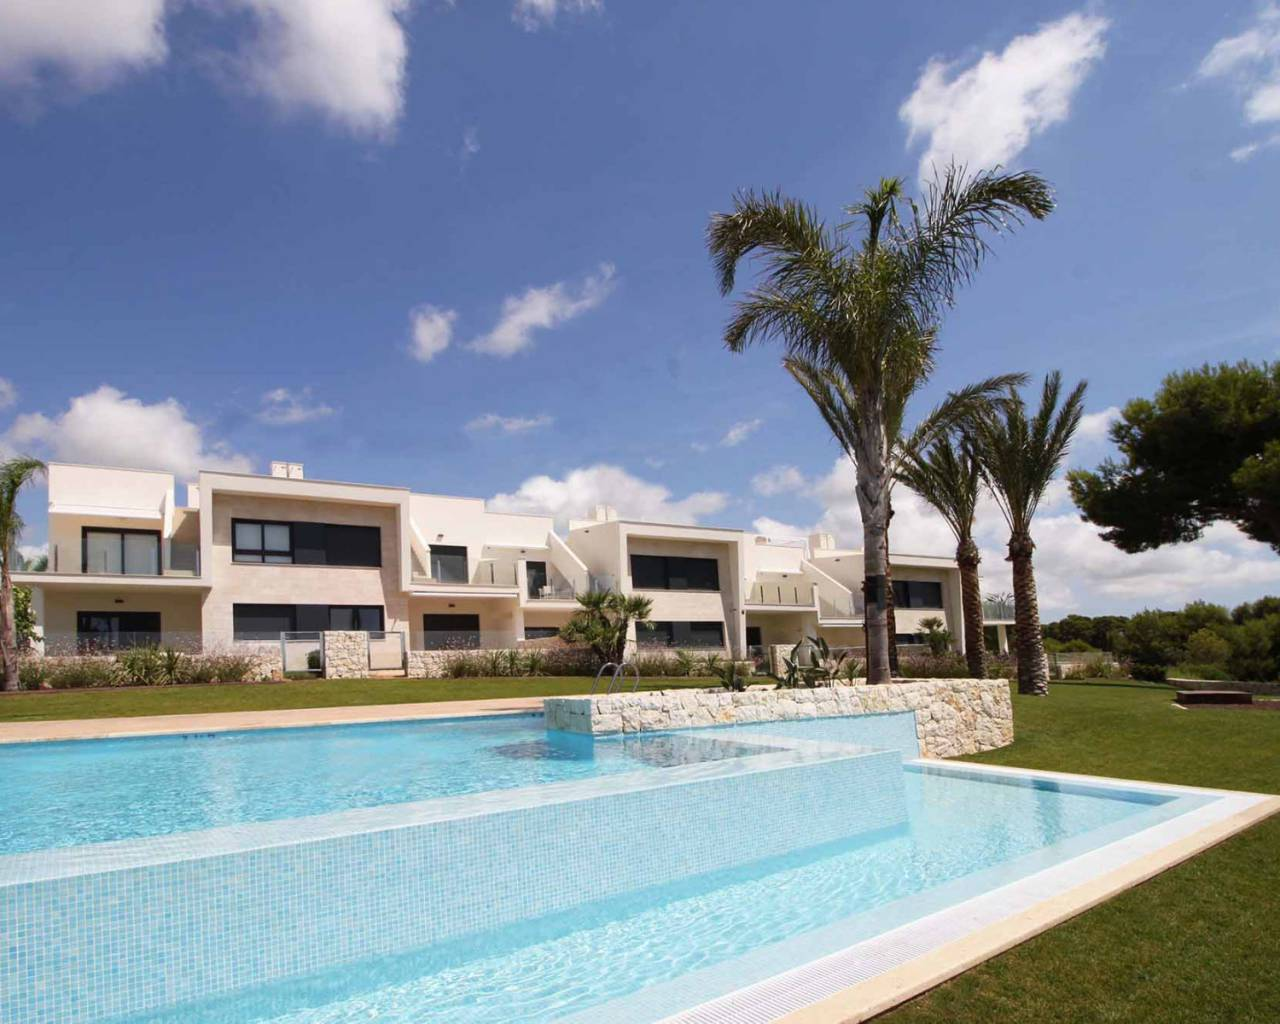 nieuwbouw-appartement-pilar-de-la-horadada_4536_xl